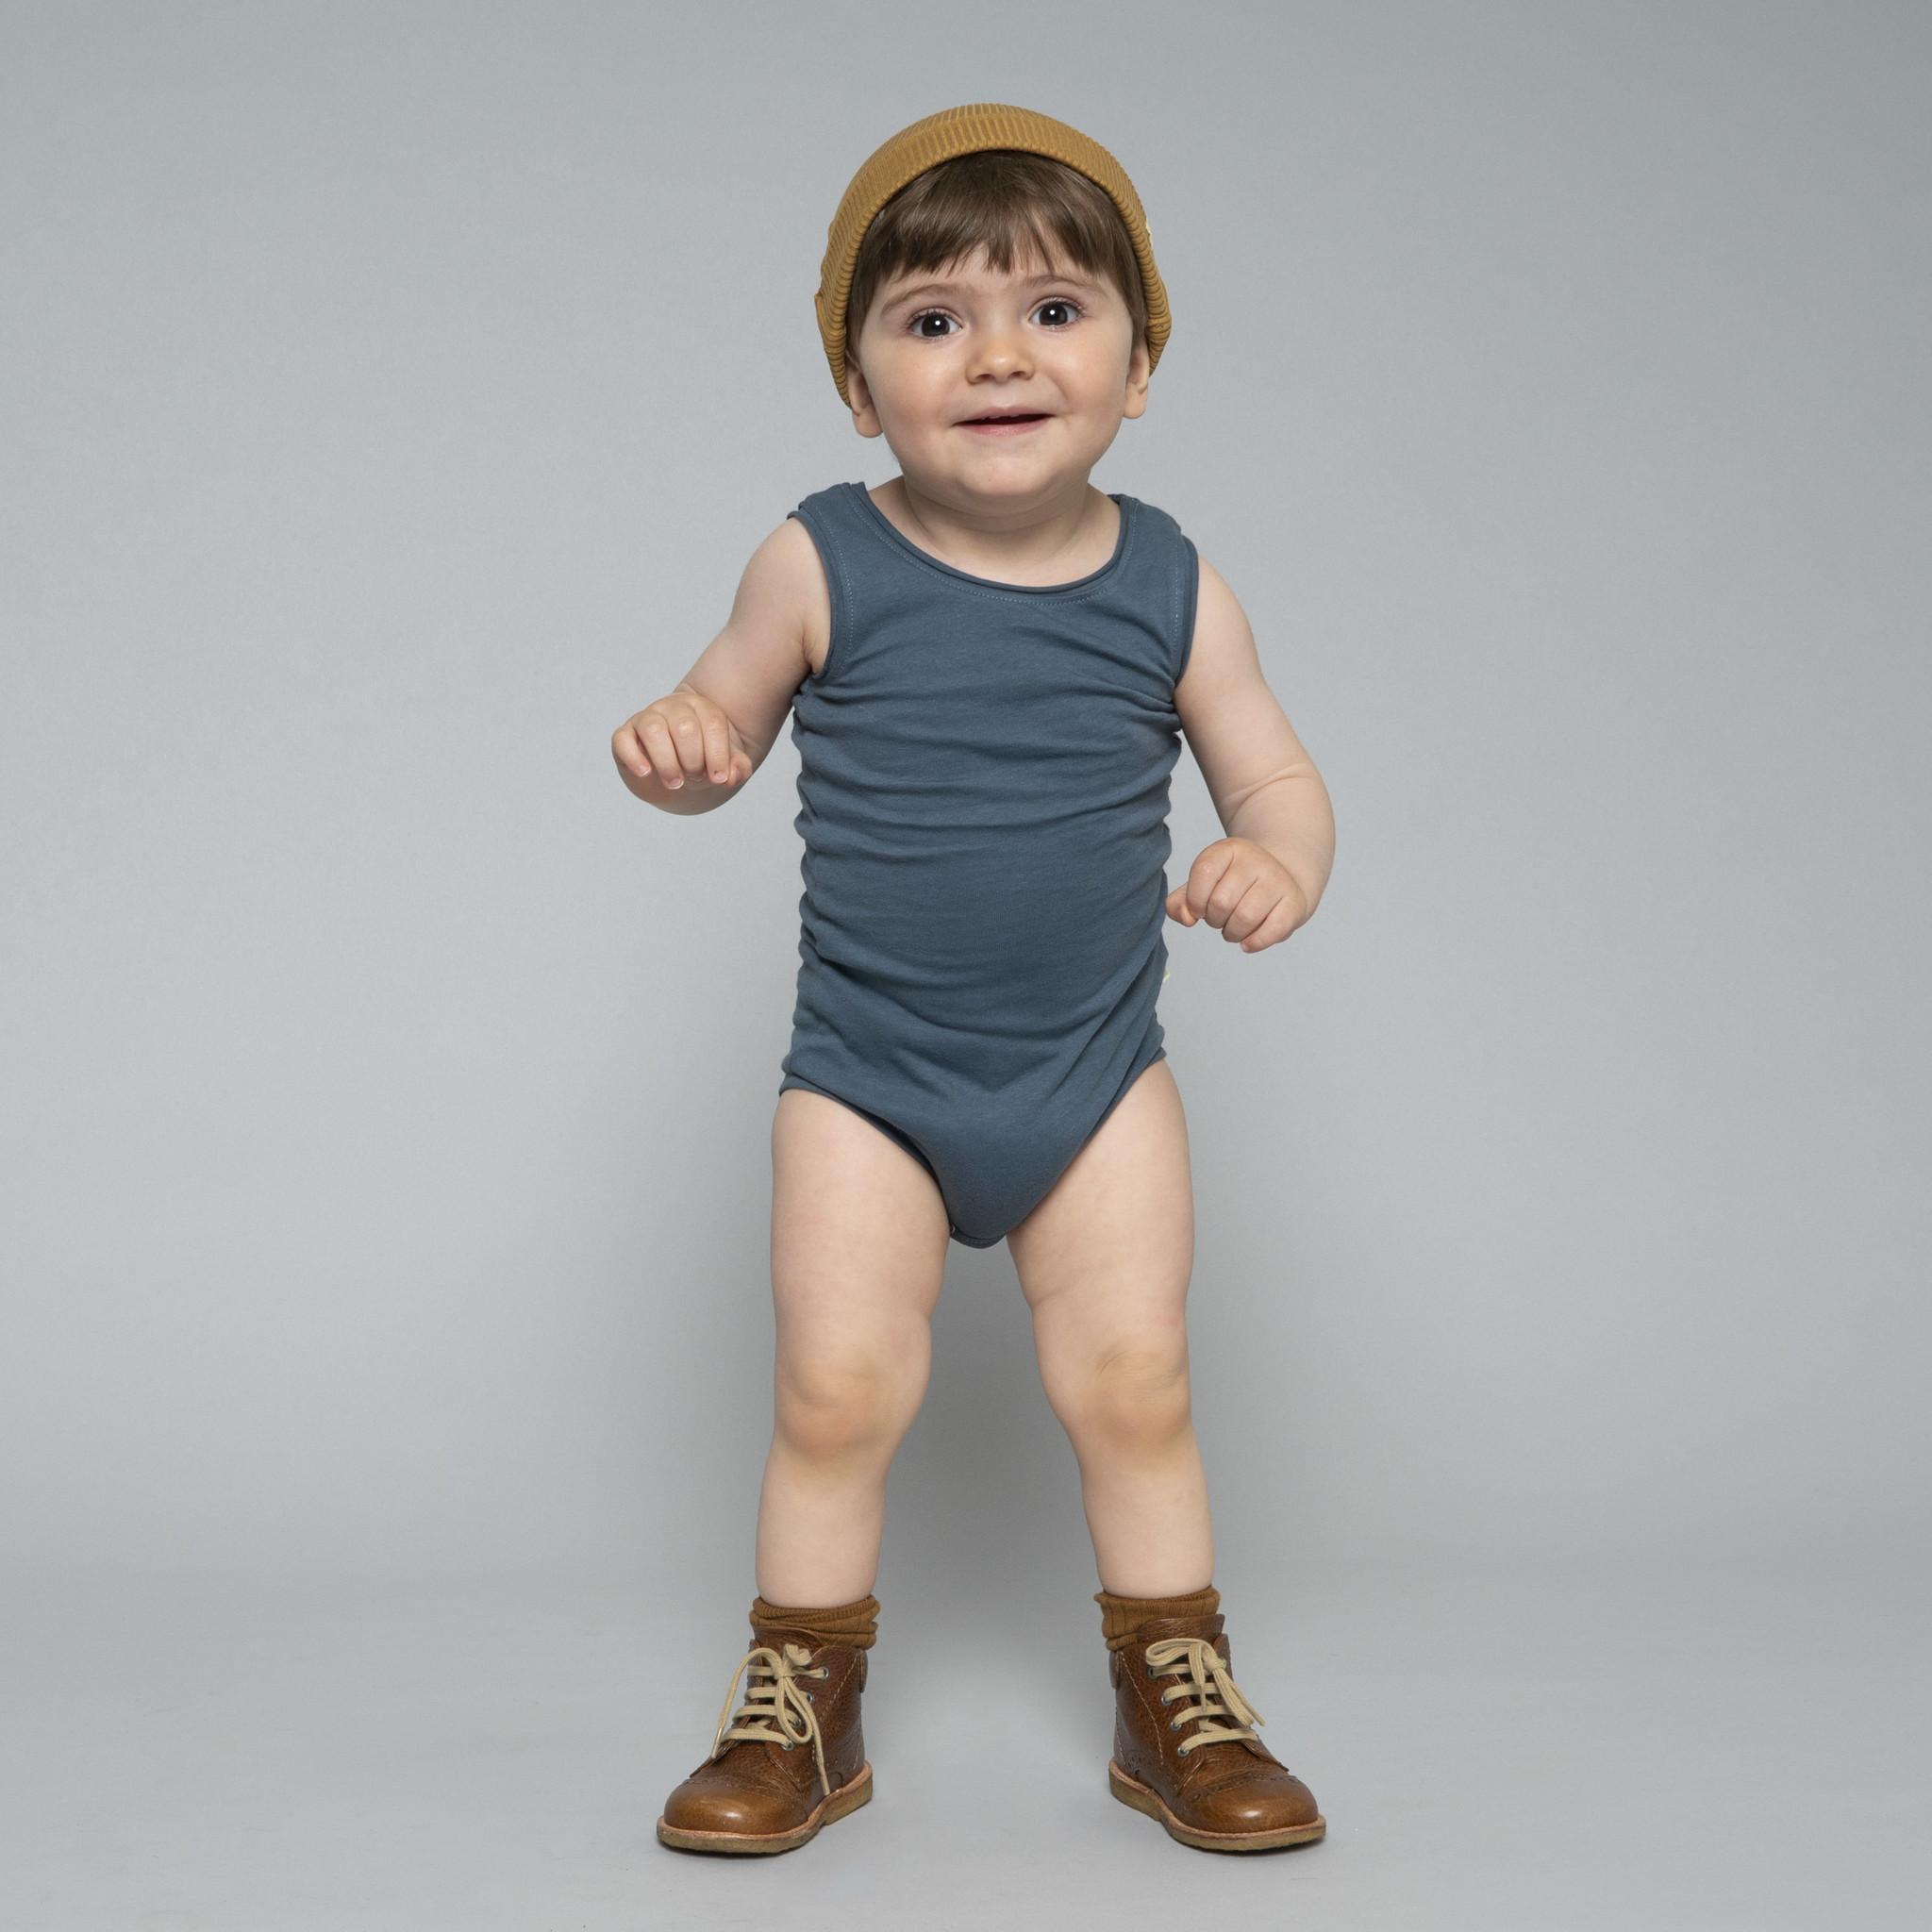 Minimalisma NAPOLI tanktop baby body  - 100% organic cotton - deep ocean blue - 1m to 3 Y